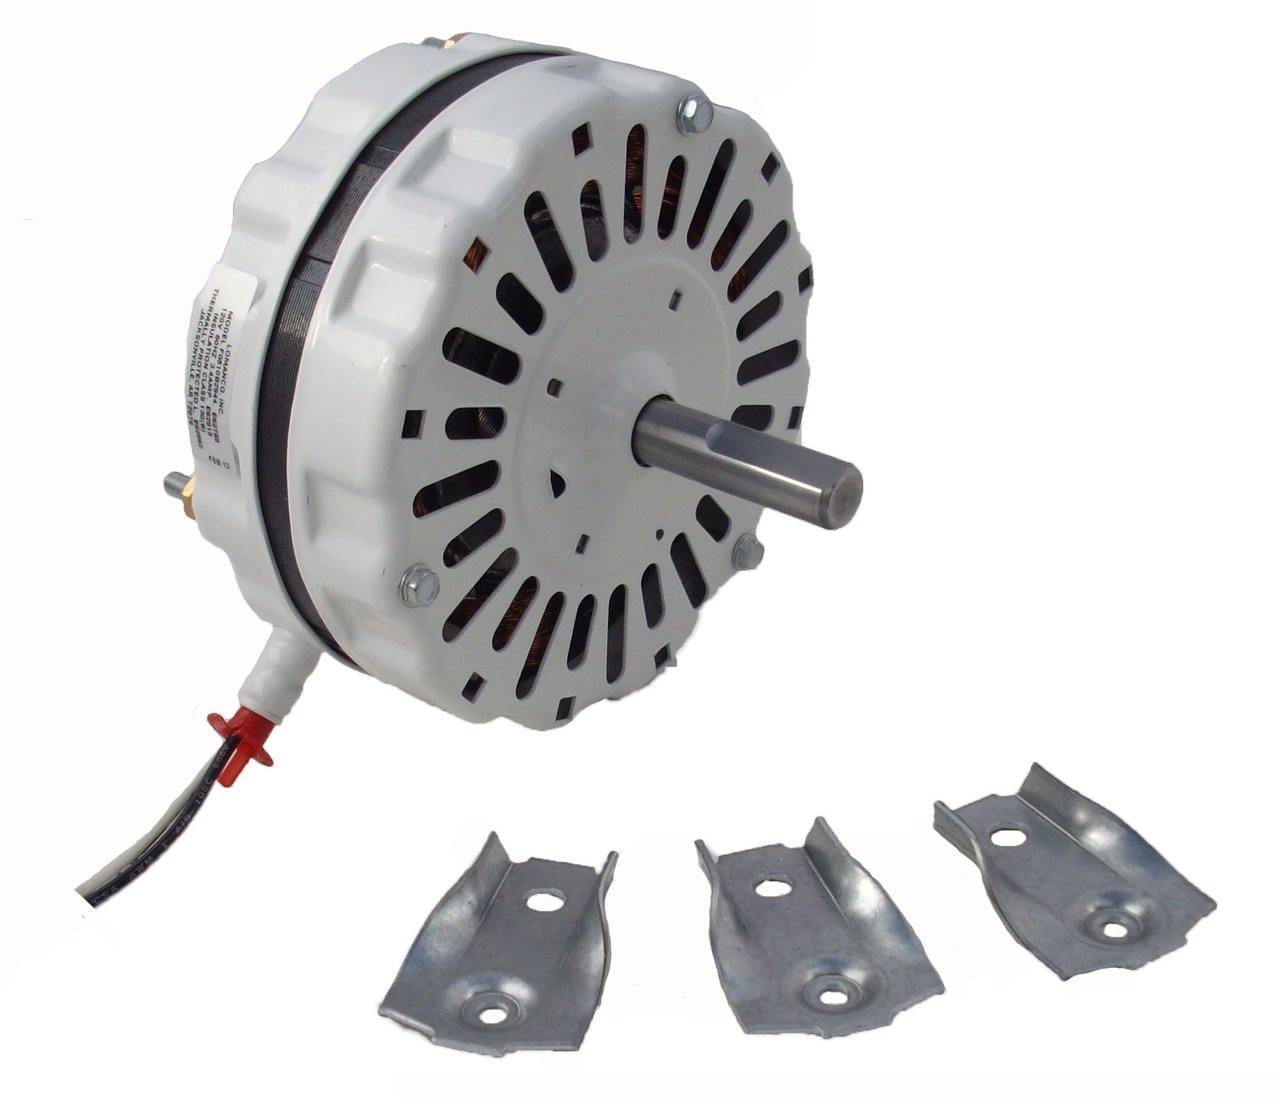 Lomanco Power Vent Attic Fan Motor 1//10 hp 1100 RPM 115V # F0510B2497